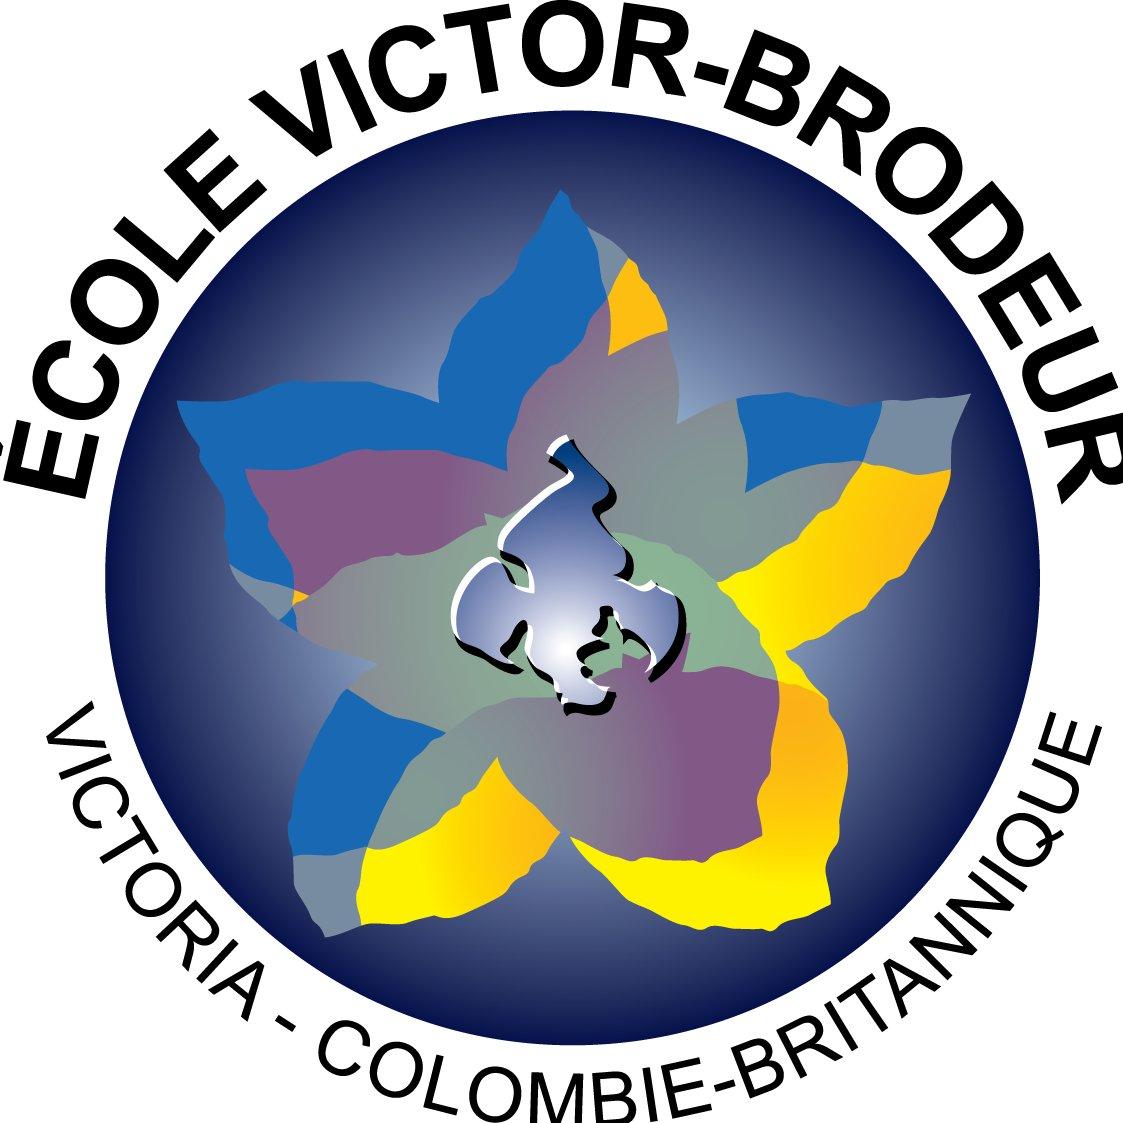 École Victor-Brodeur logo: Click to enlarge